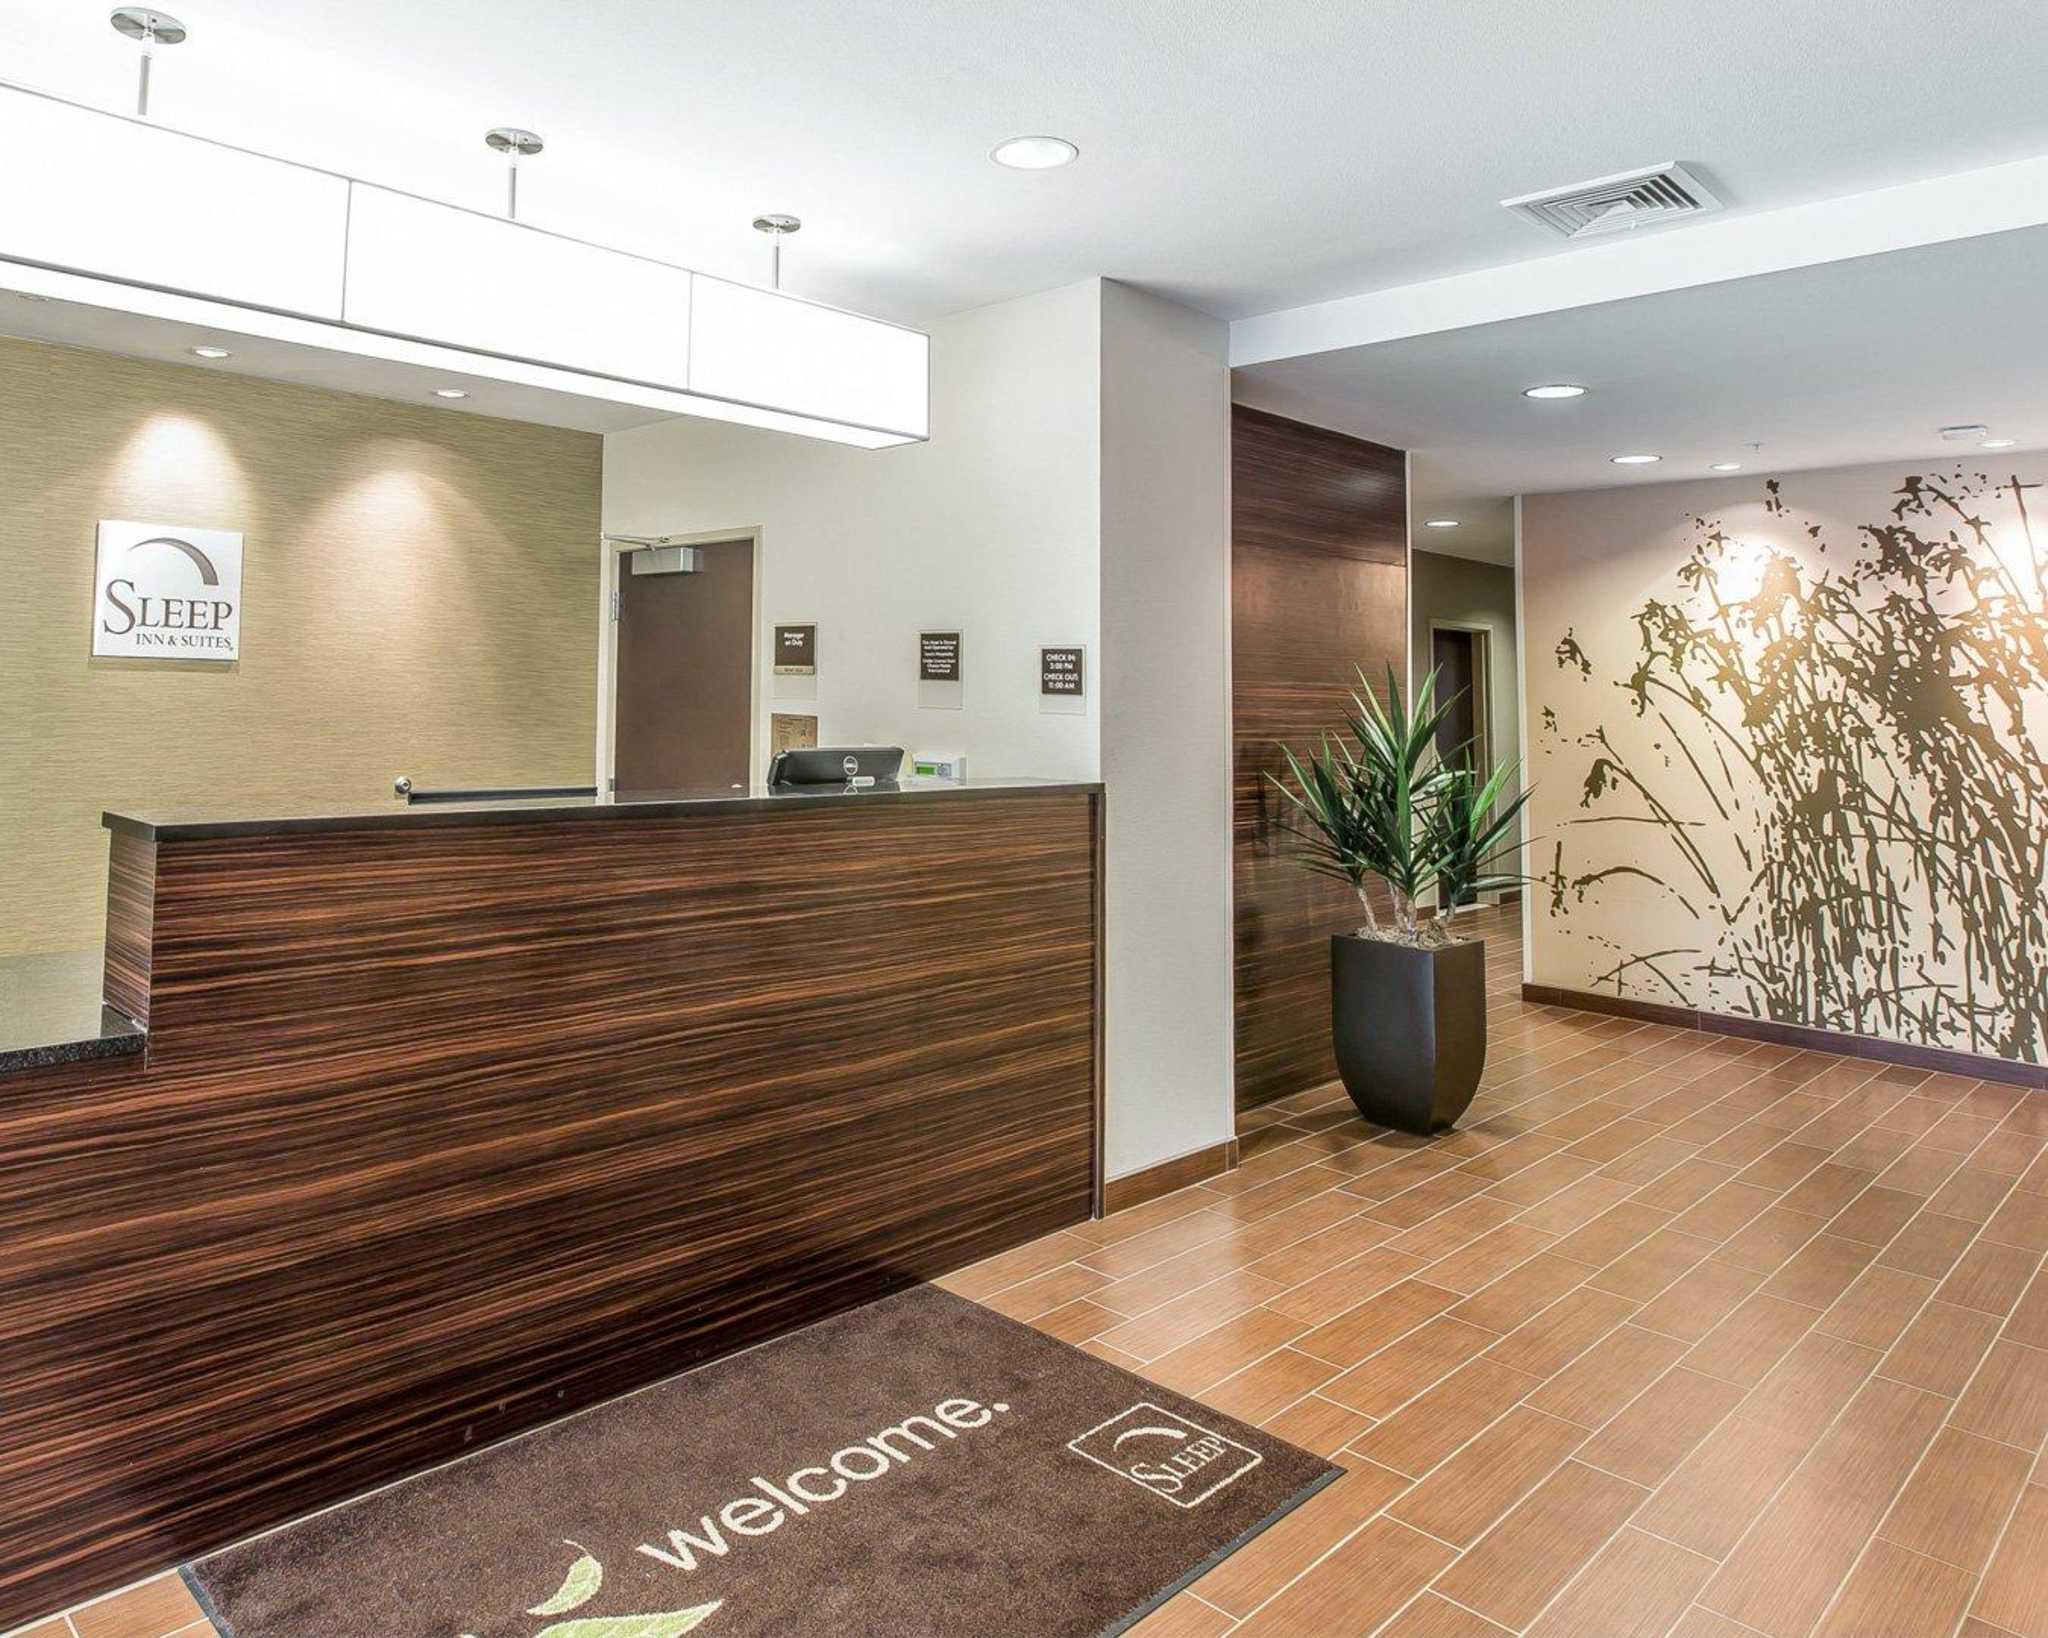 Hotels In Enterprise Al With Indoor Pool